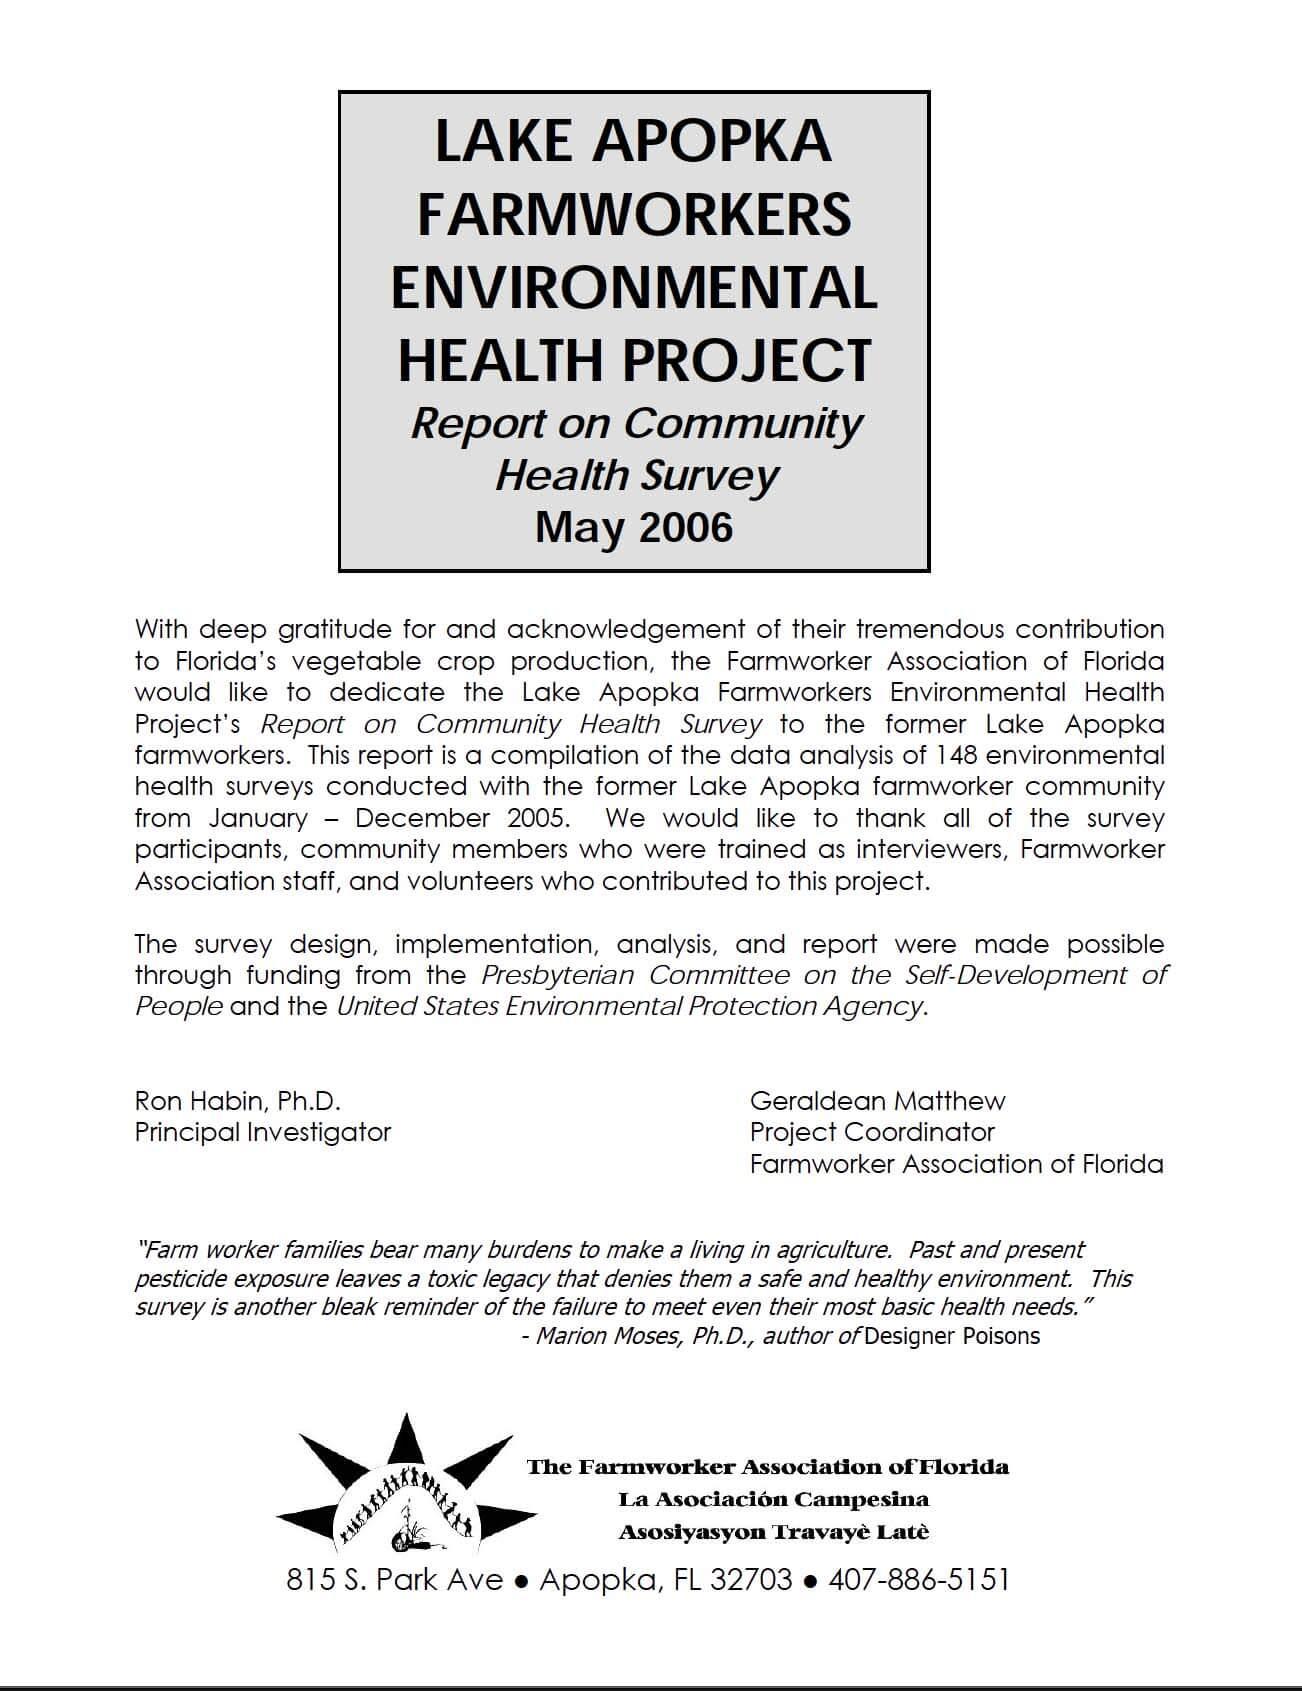 Lake Apopka Farmworkers Environmental Health Project cover